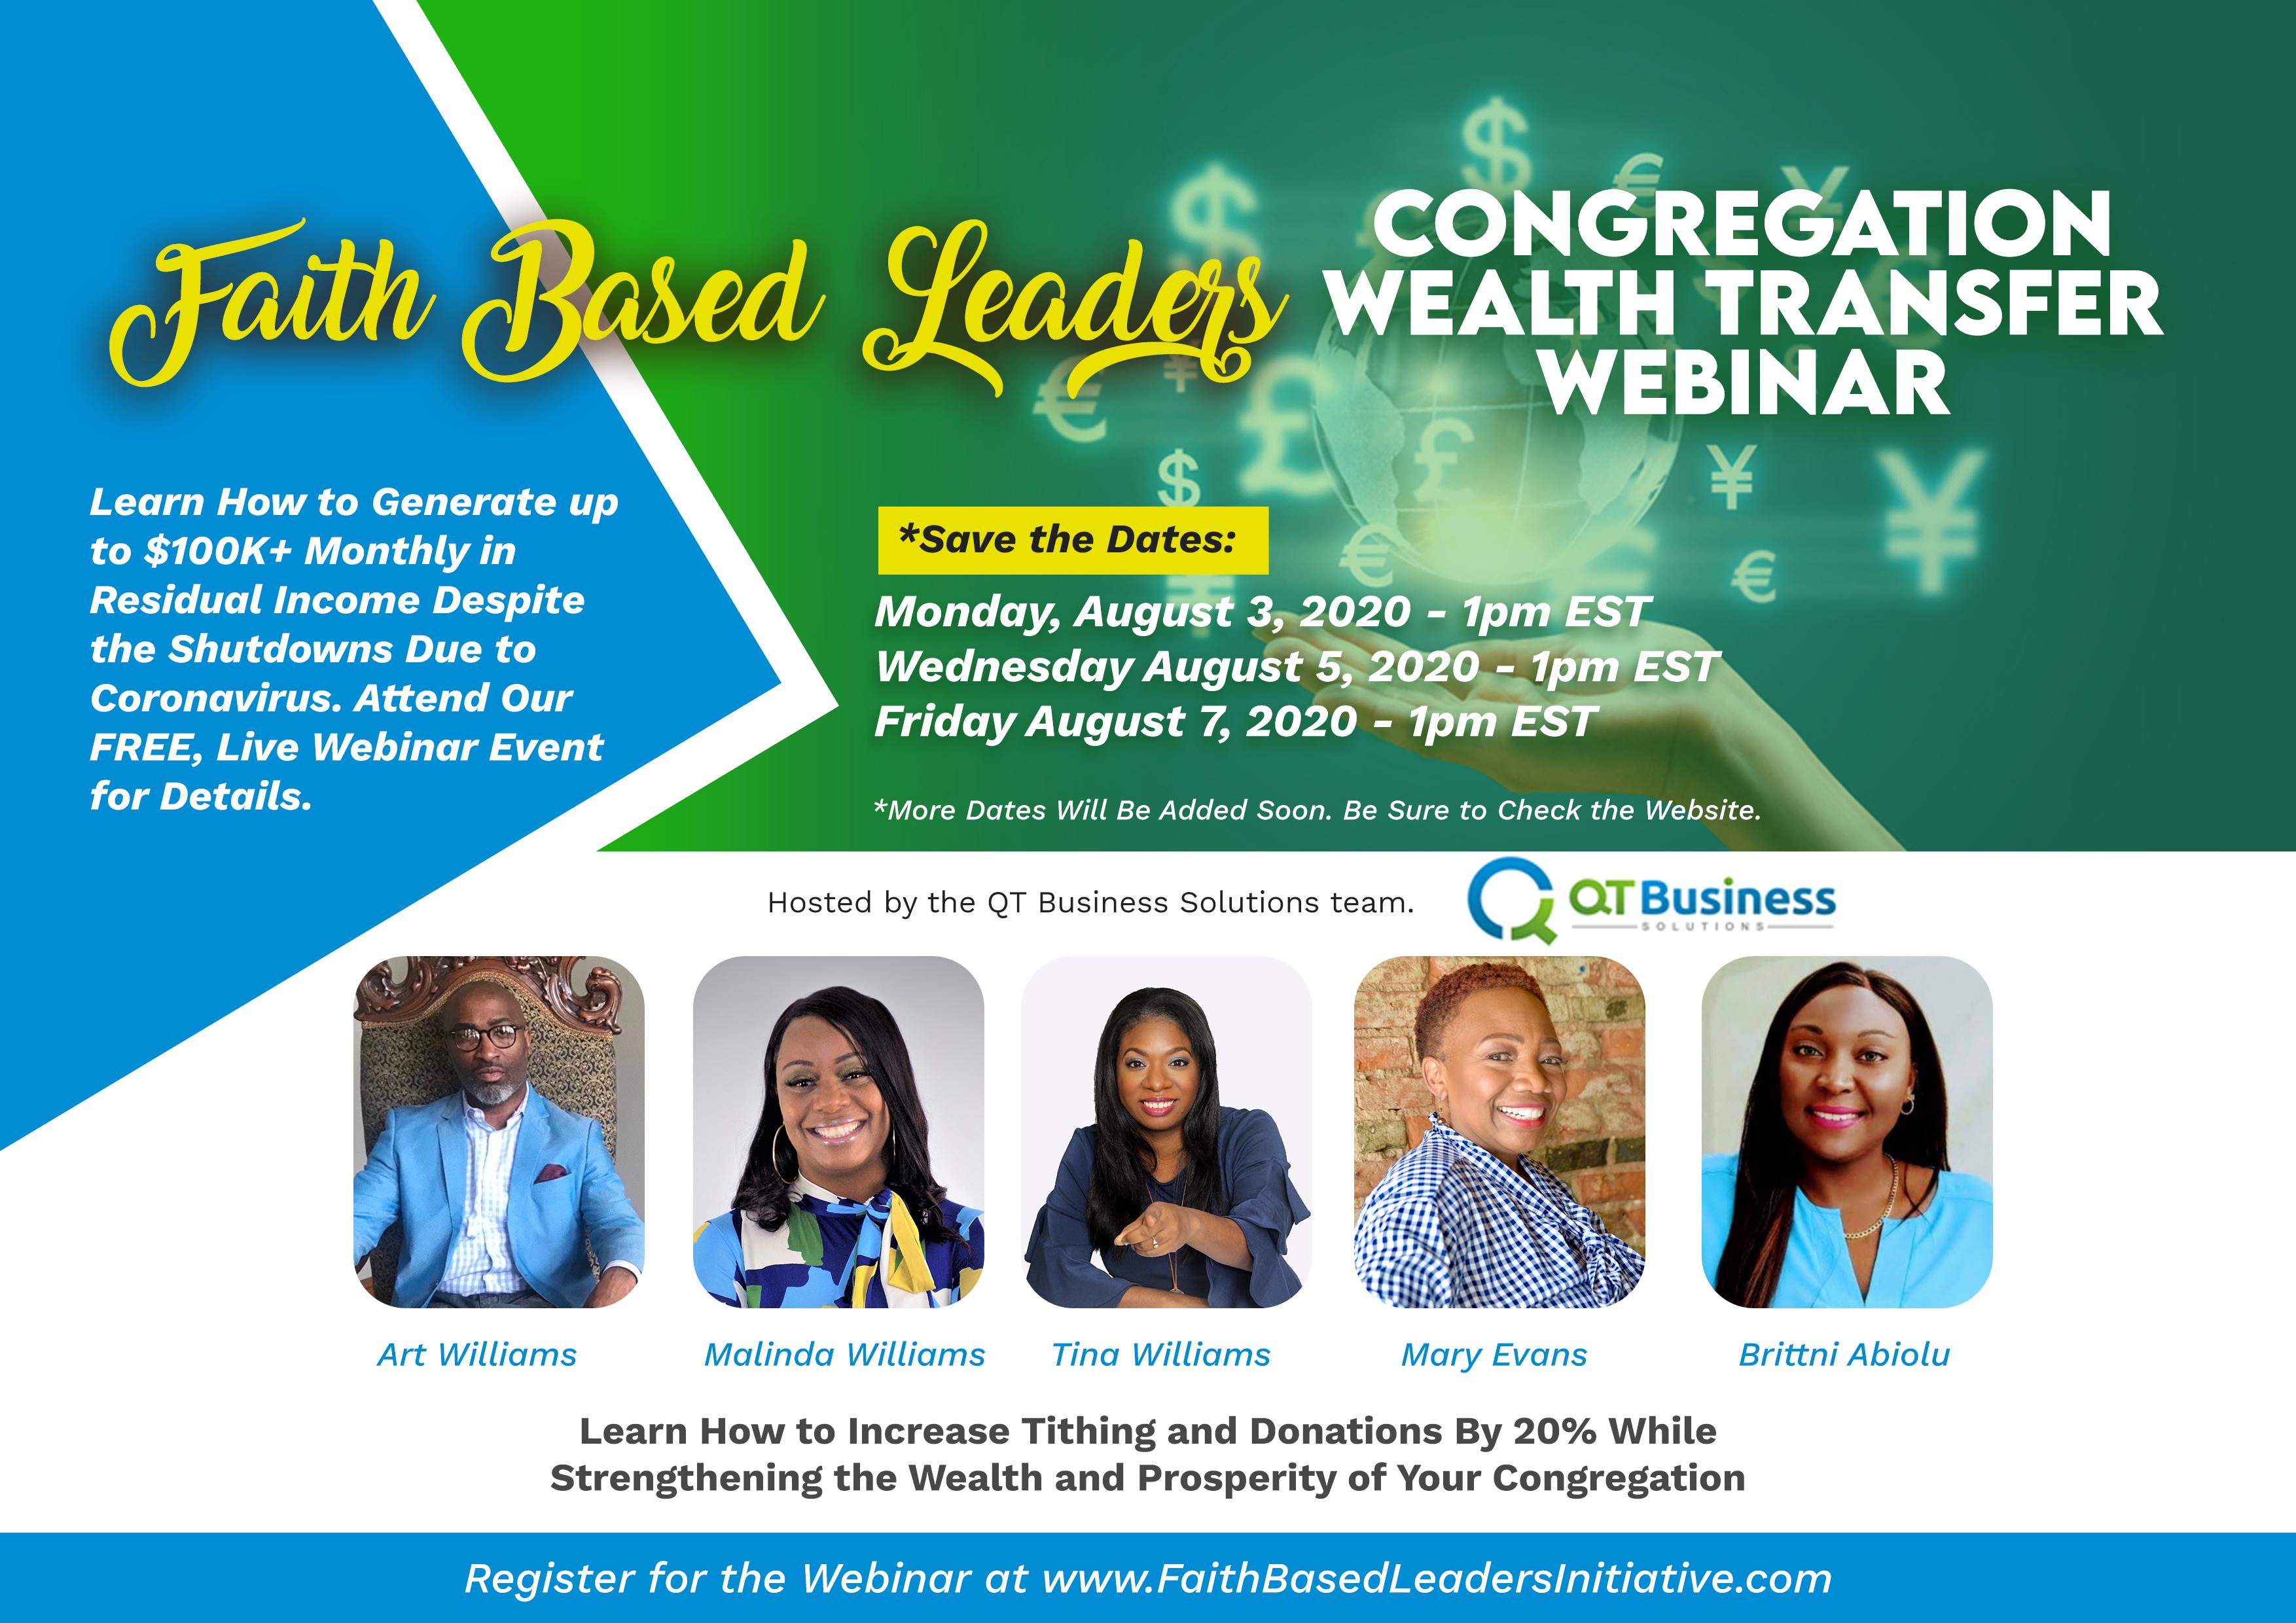 Faith Based Leaders Congregation Wealth Transfer Webinar